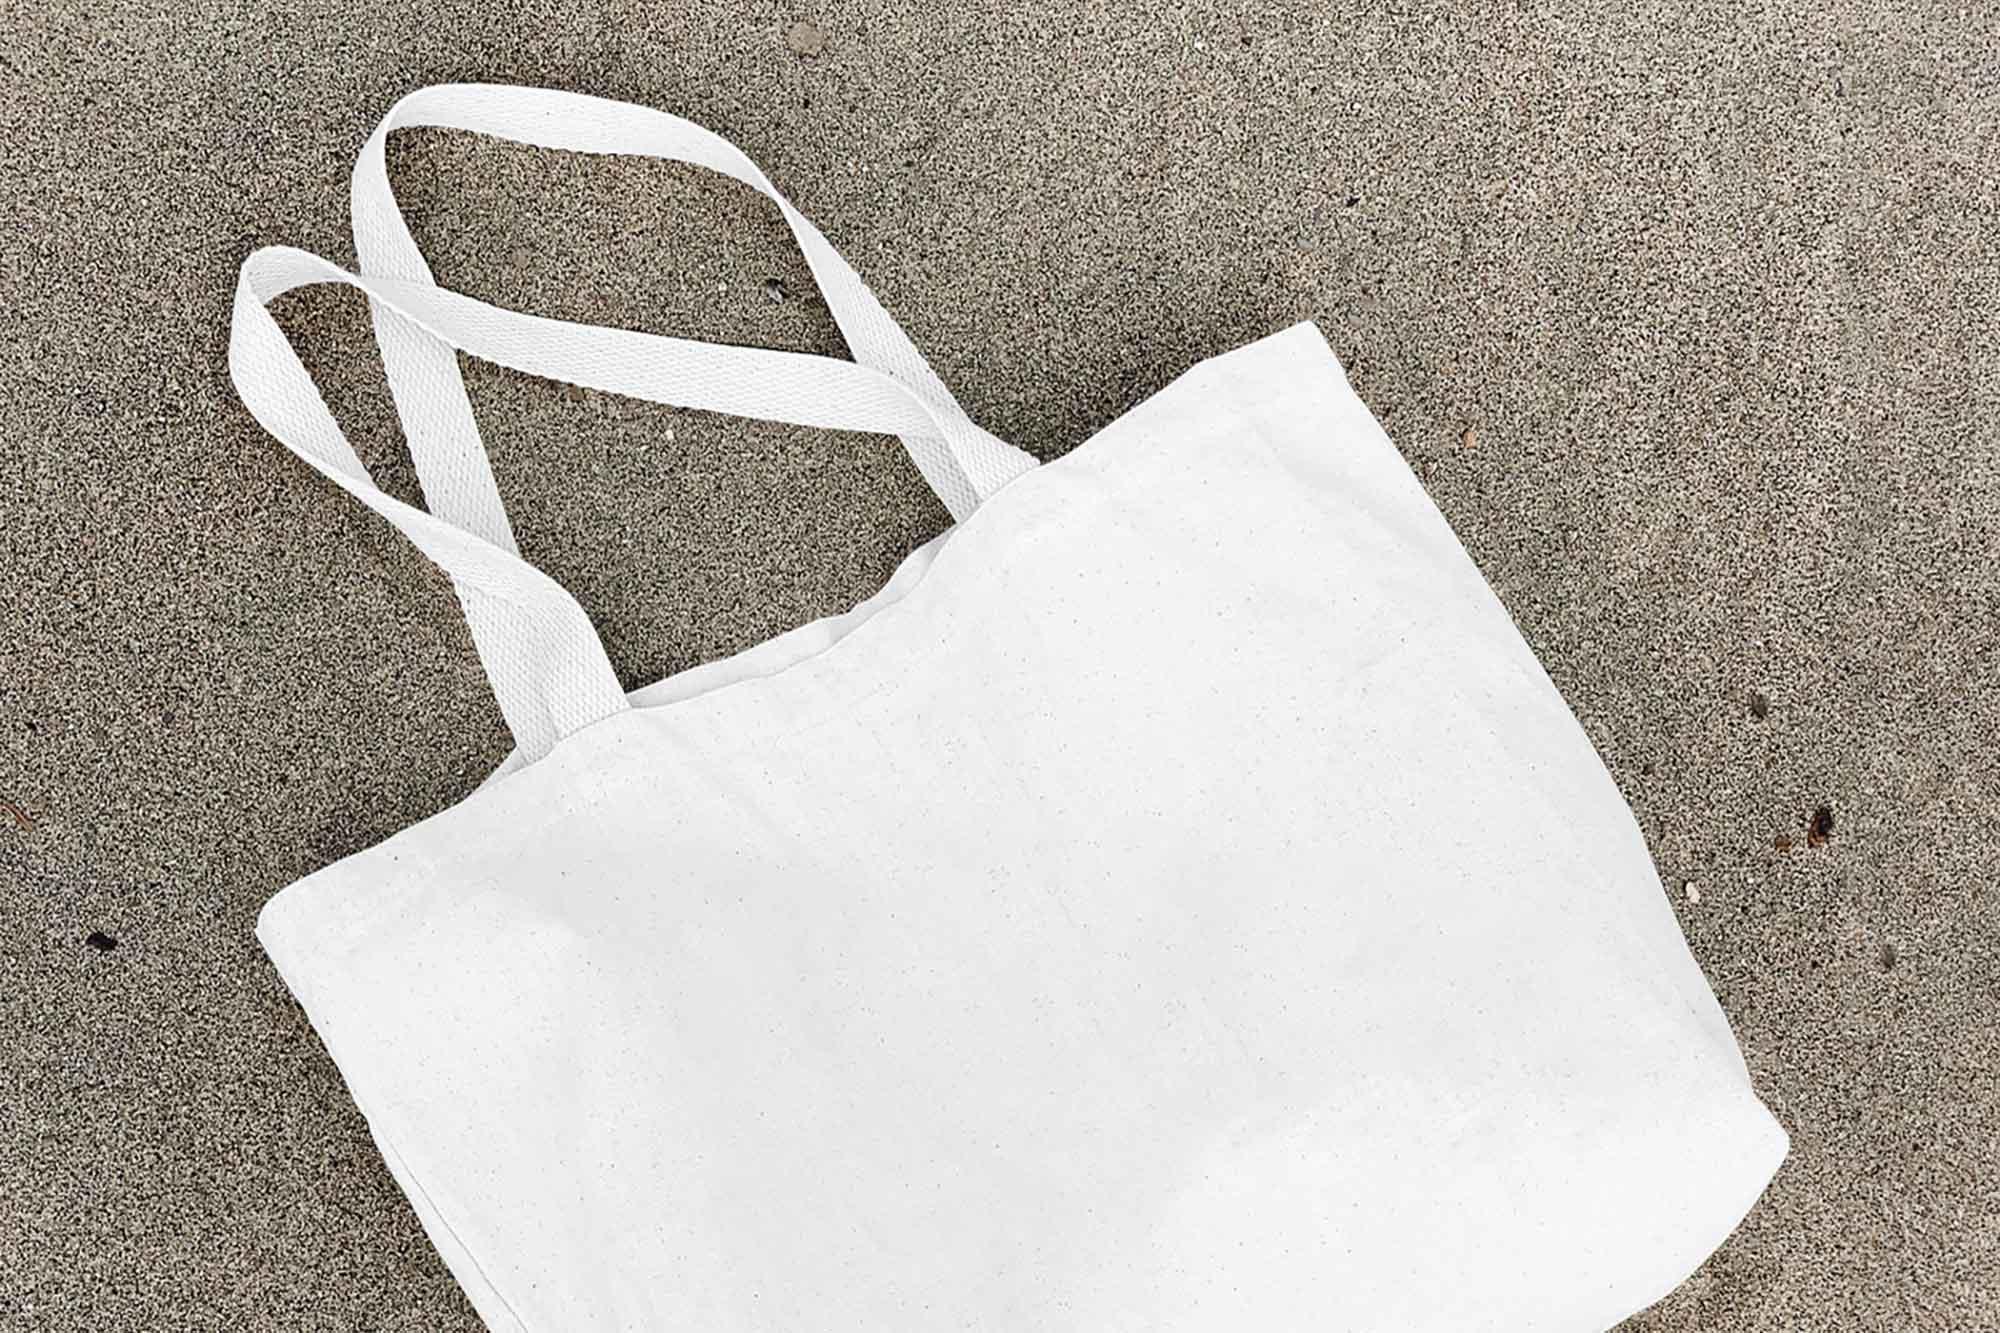 Cotton Canvas Bag Mockup 2